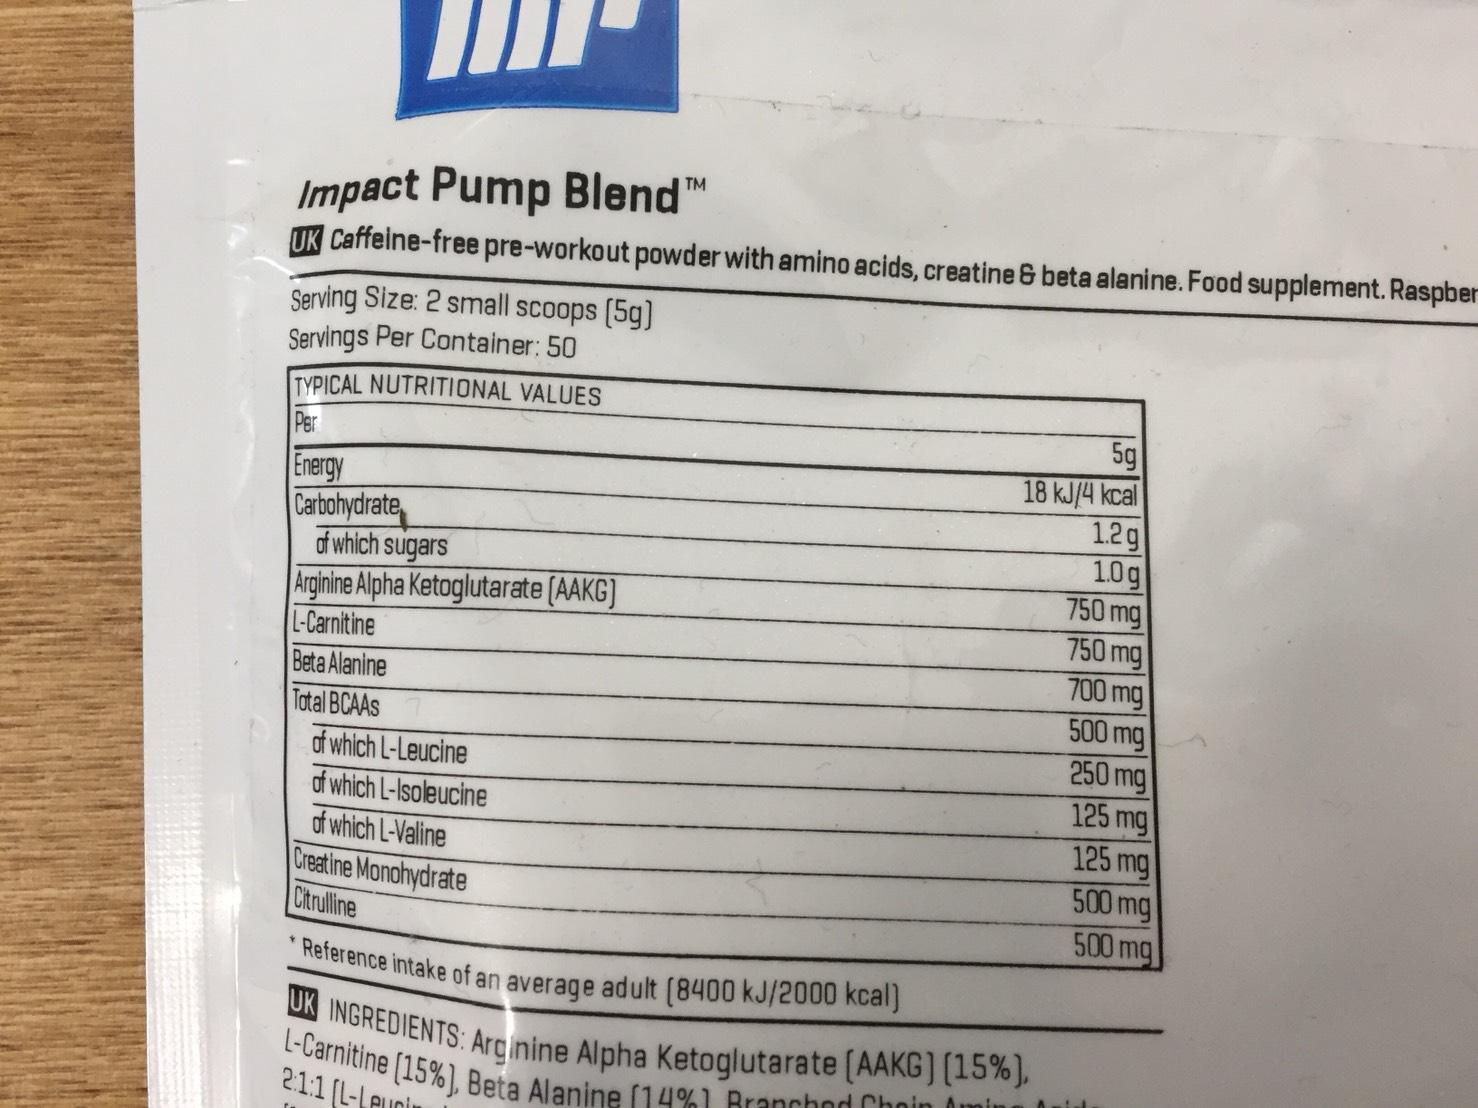 IMPACT パンプブレンド「RASPBERRY LEMONADE FLAVOUR(ラズベリーレモネード味)」の成分表